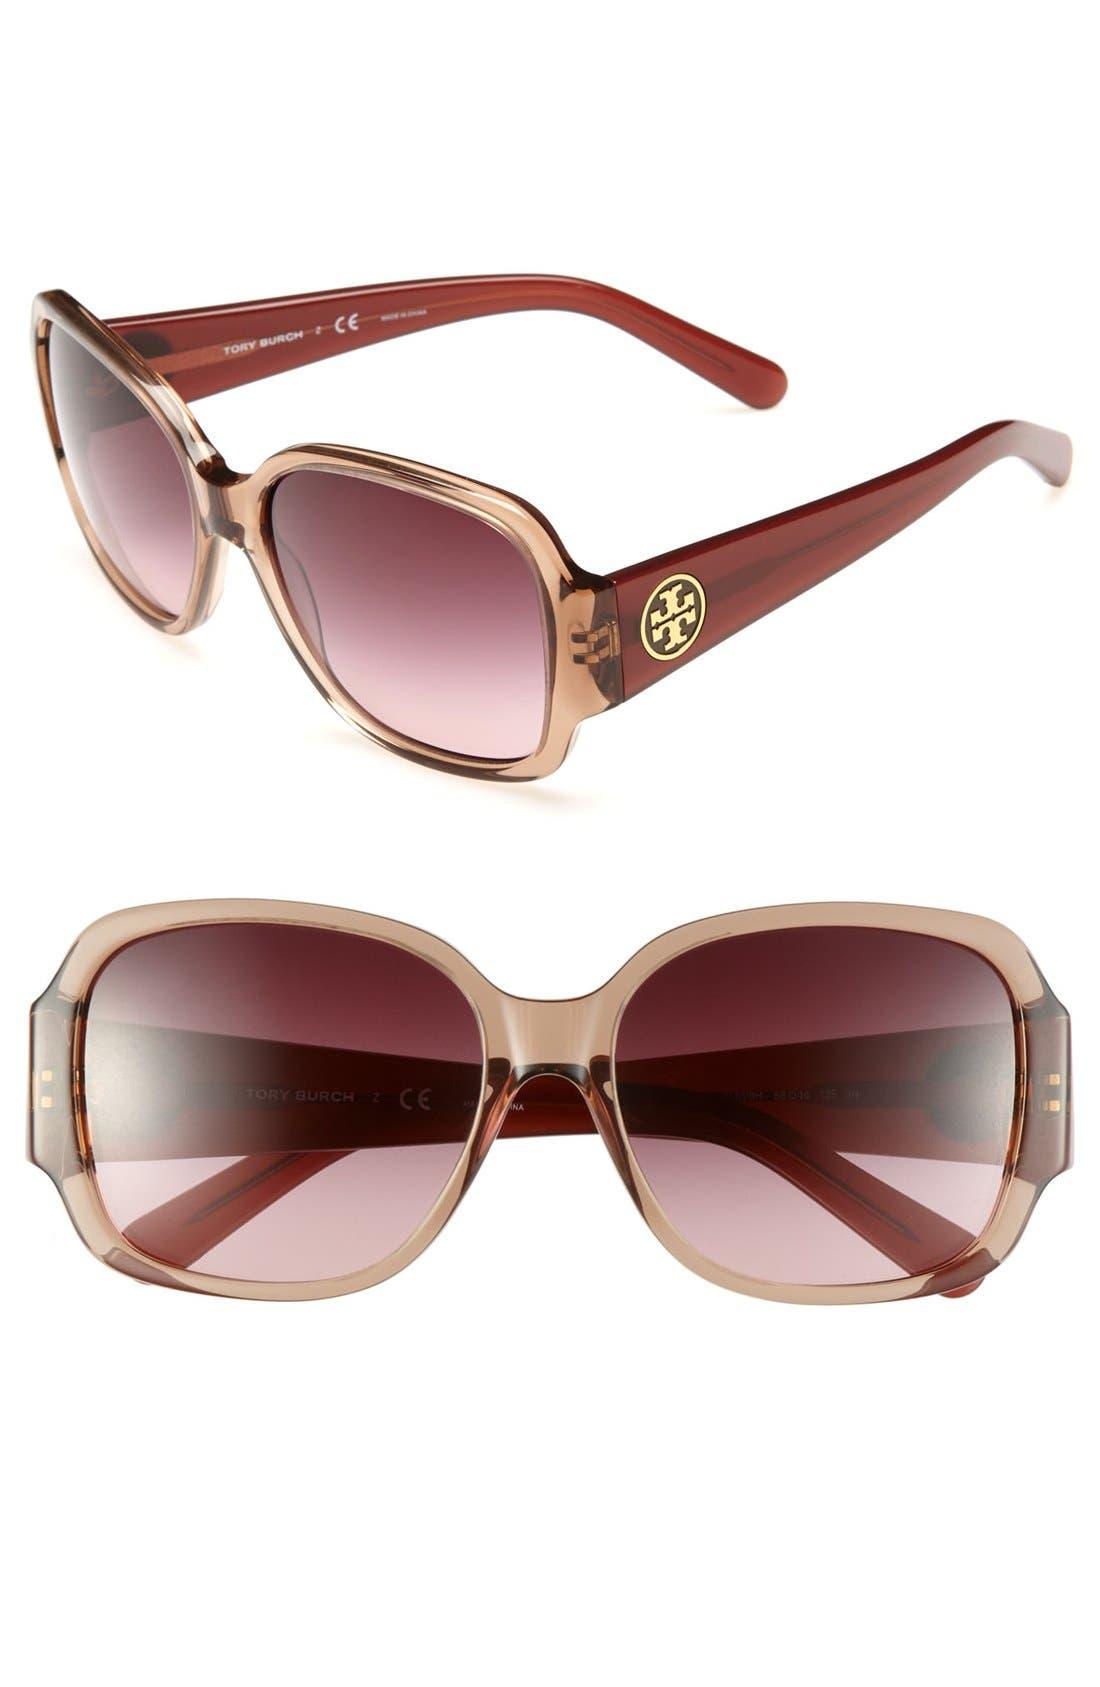 Alternate Image 1 Selected - Tory Burch 'Glam' 58mm Sunglasses